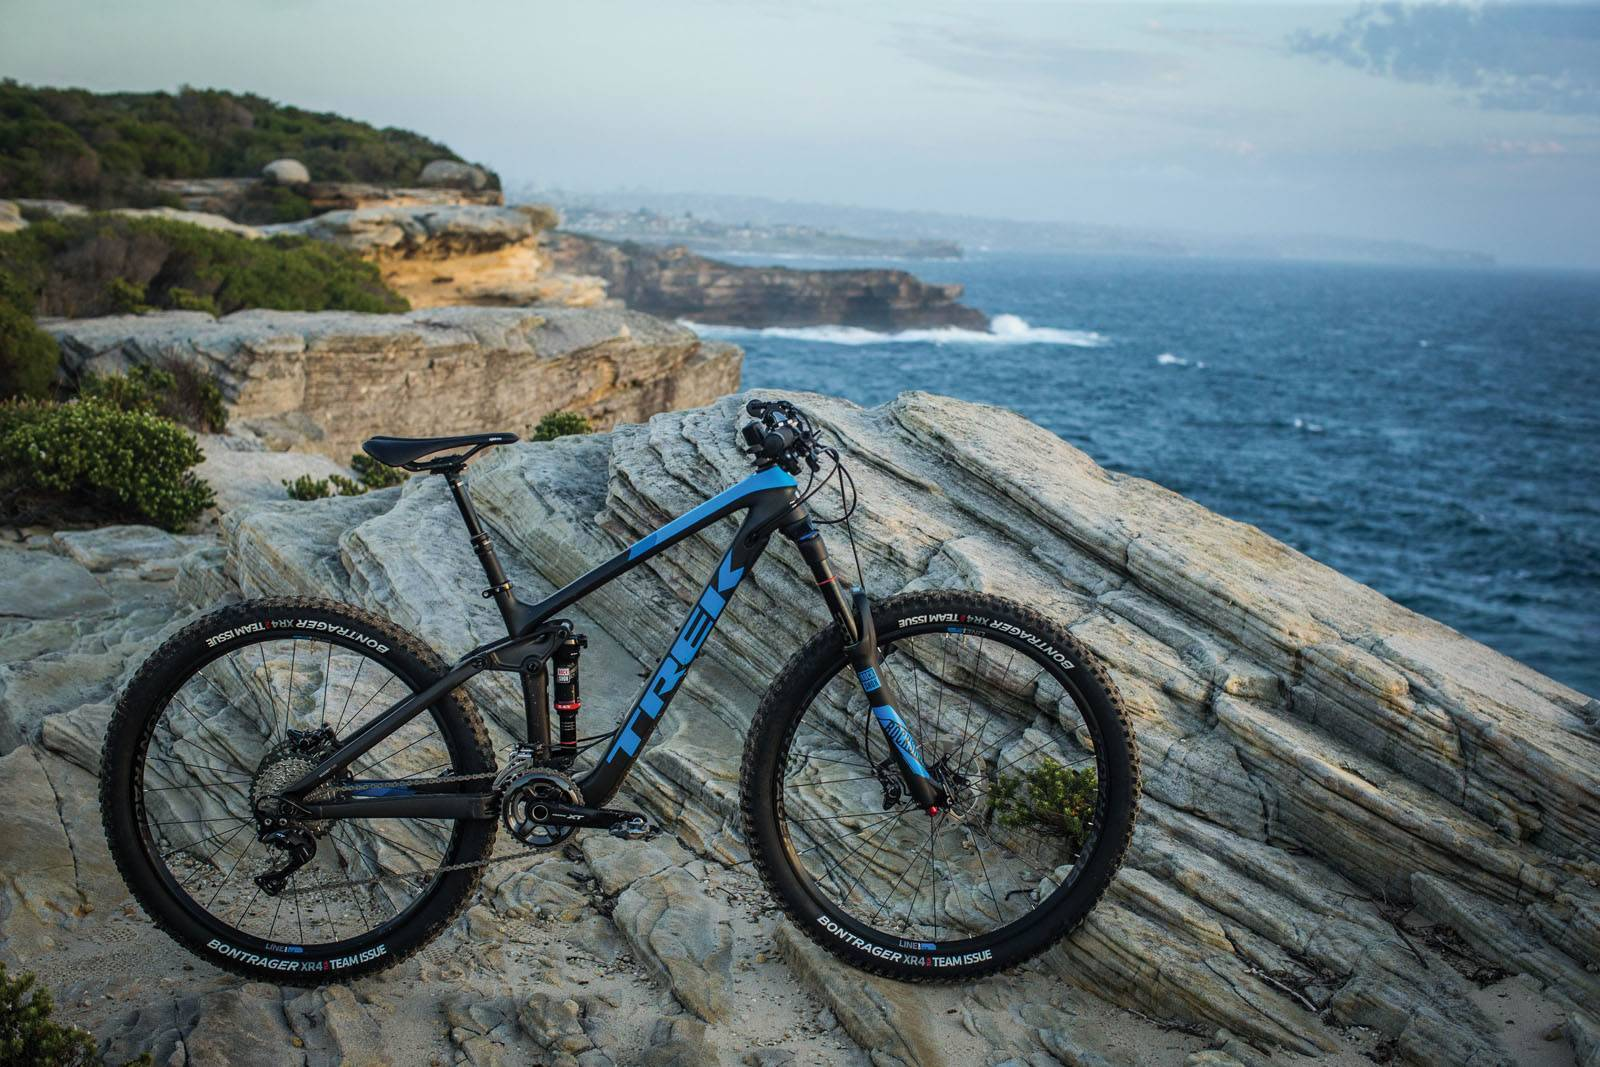 593762b6f71 TESTED: Trek Remedy 9.8 - Australian Mountain Bike | The home for ...